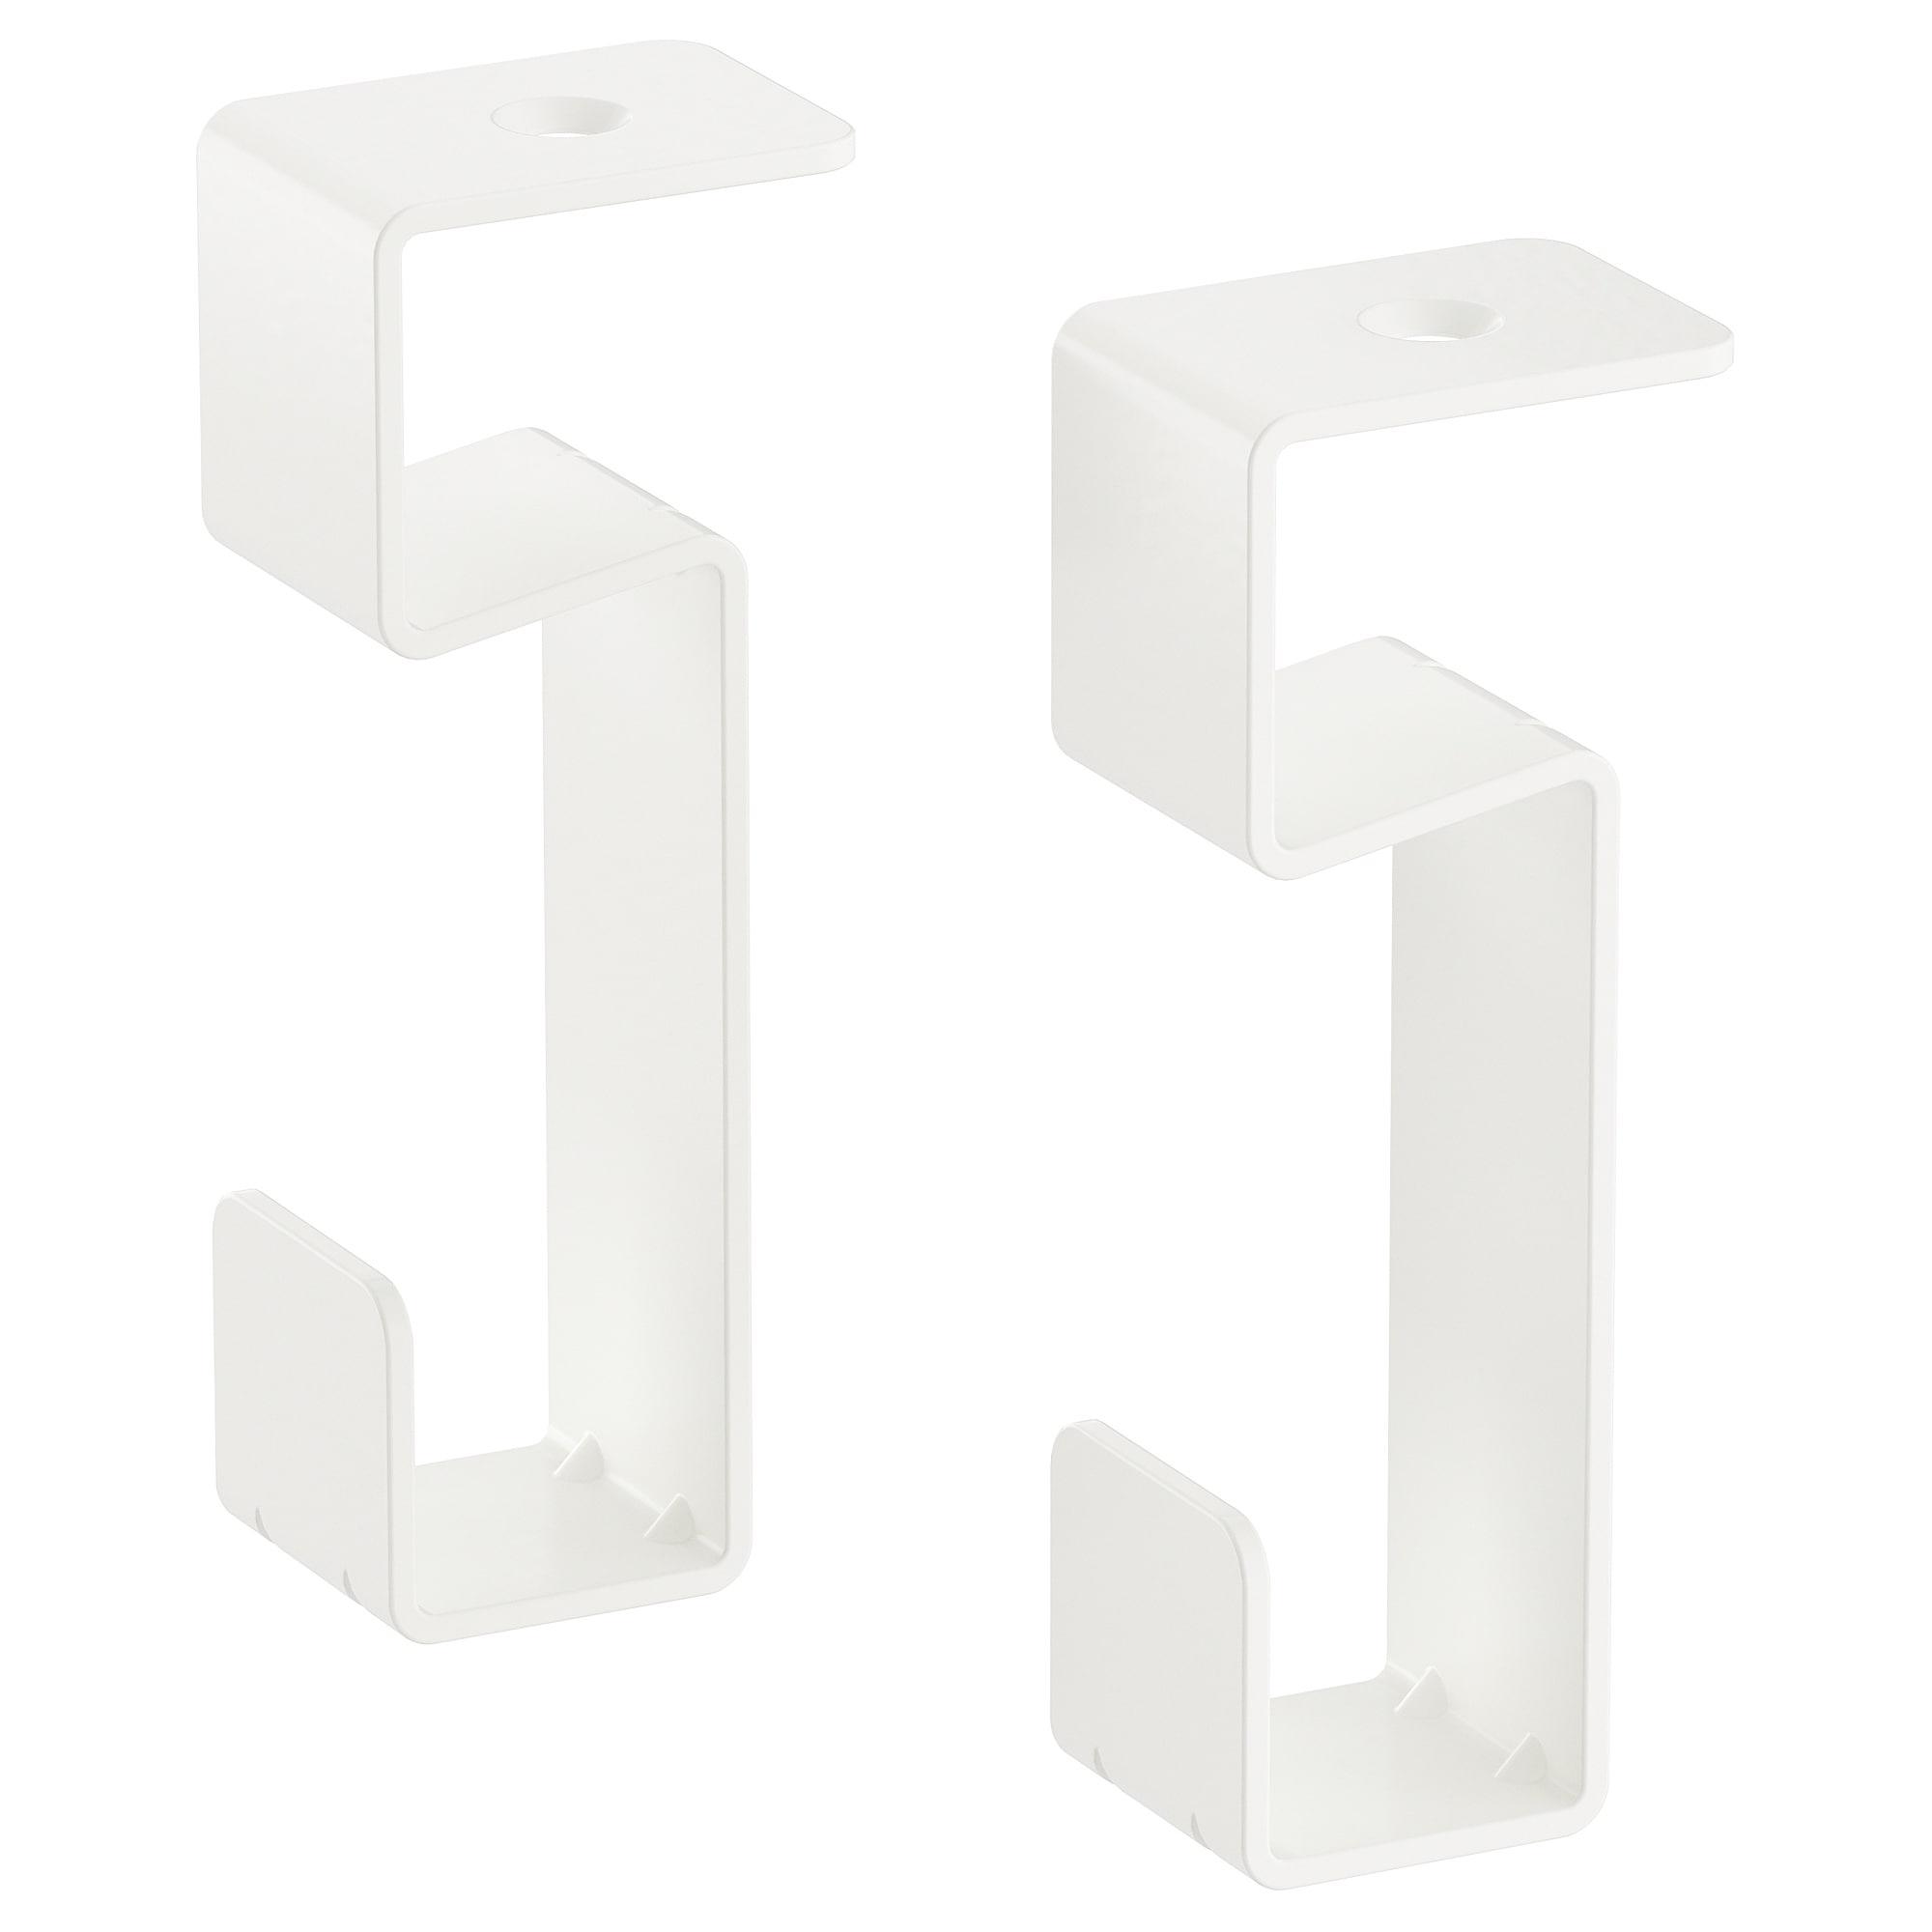 Крючок для полки ИВАР белый артикуль № 703.855.08 в наличии. Онлайн каталог IKEA РБ. Недорогая доставка и соборка.